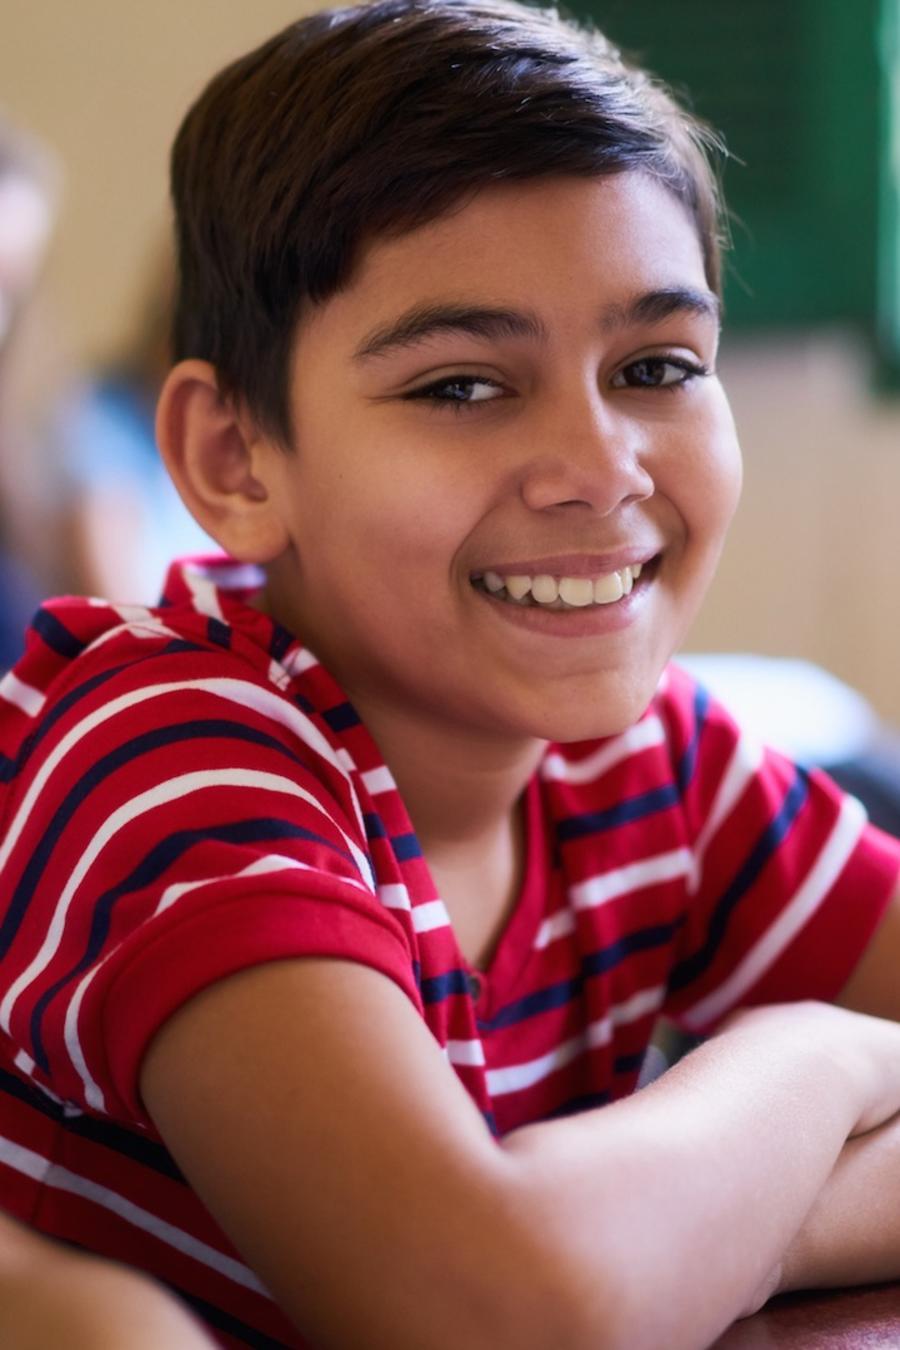 Niño sentado en aula de escuela